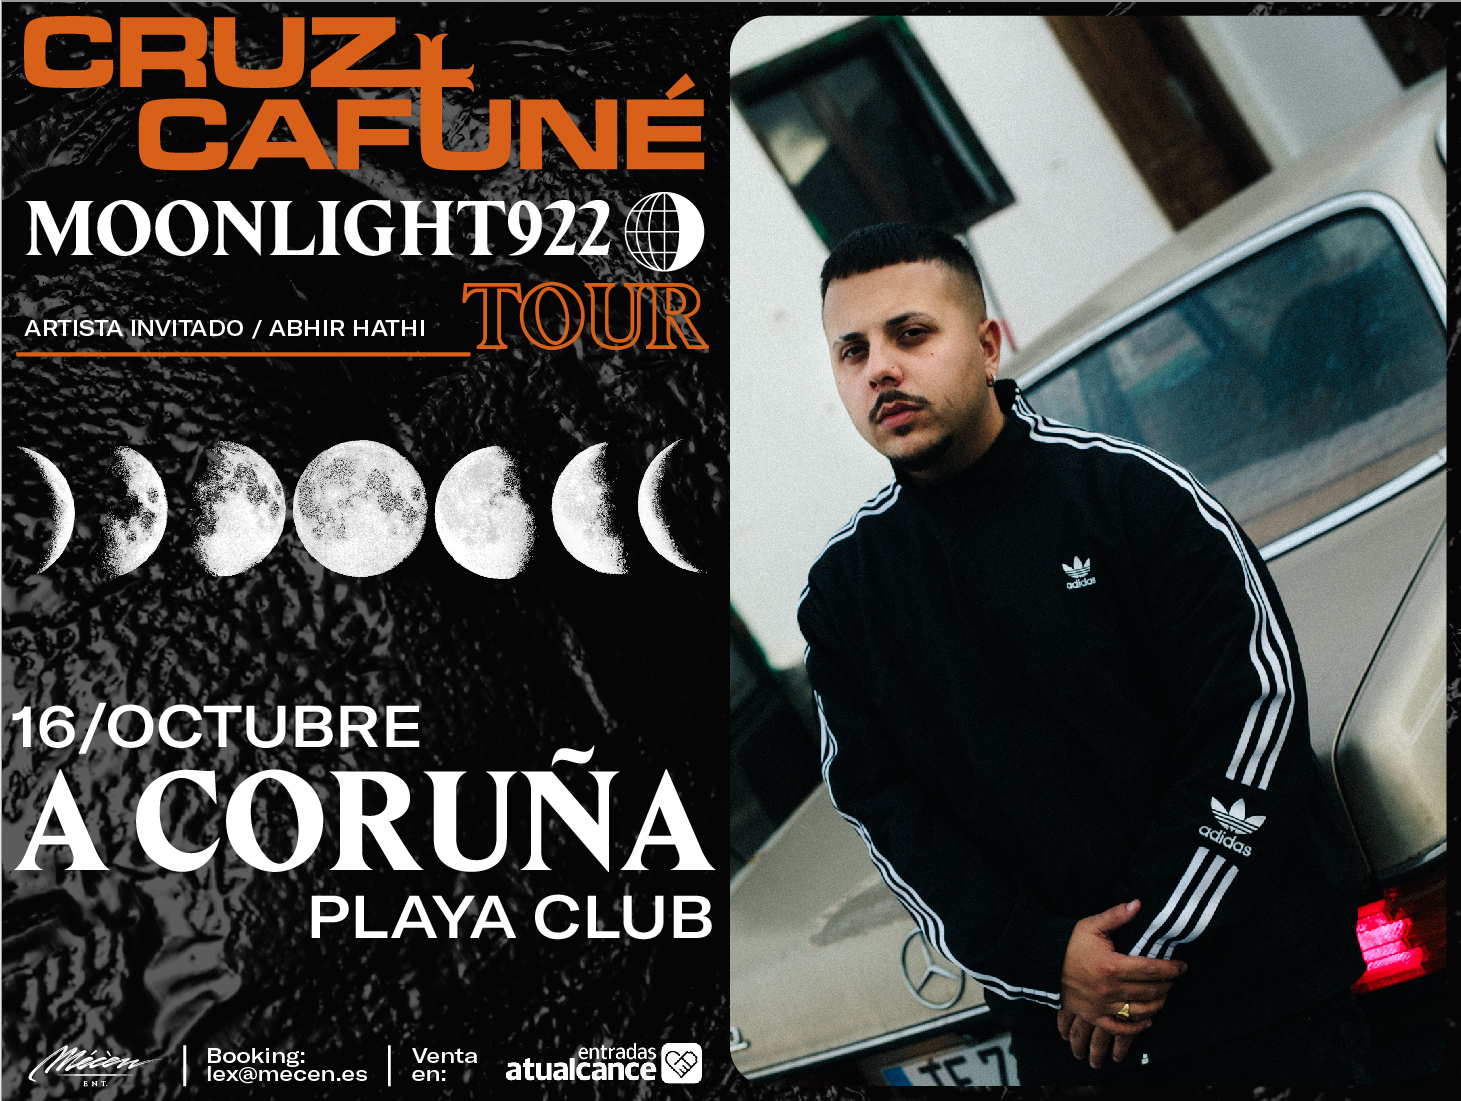 cruz-cafune-a-coruna-5e945198d1117.jpeg